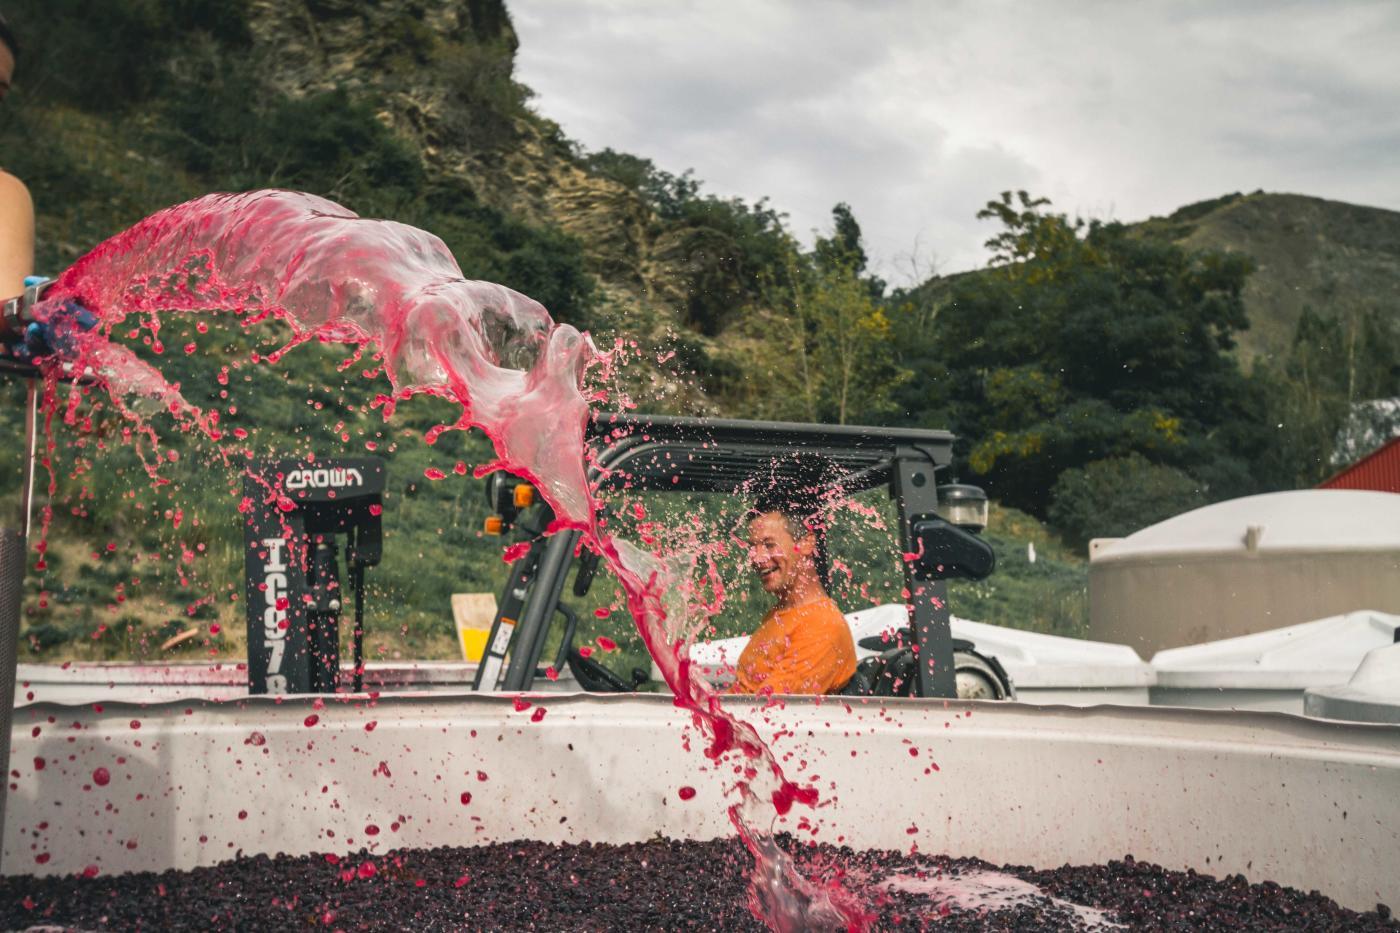 Pinot Harvest at Gibbston Valley Winery